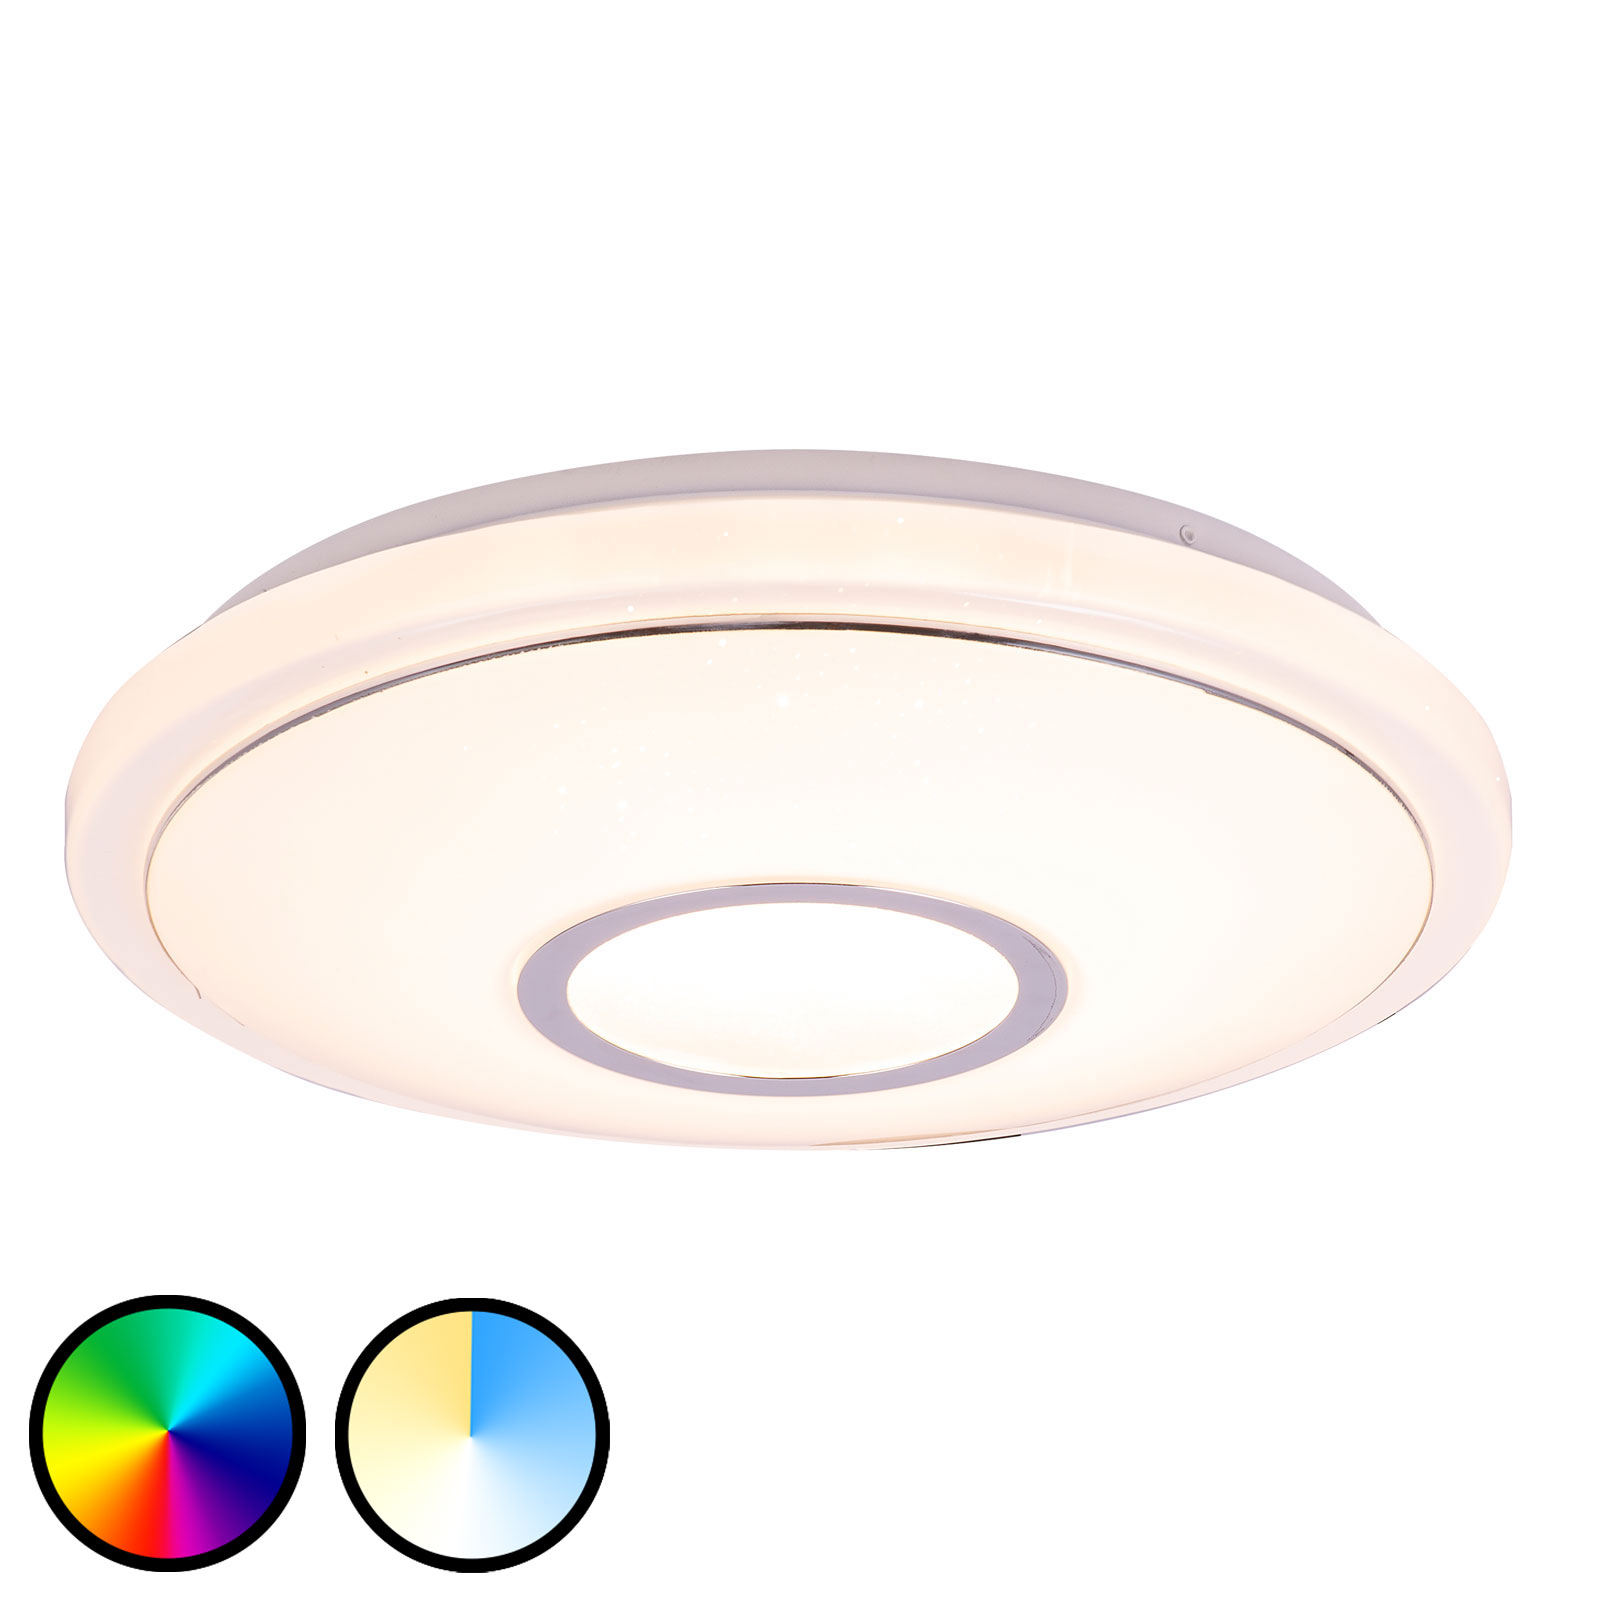 LED-Deckenleuchte Conner, Tuya-Smart, Ø 40 cm